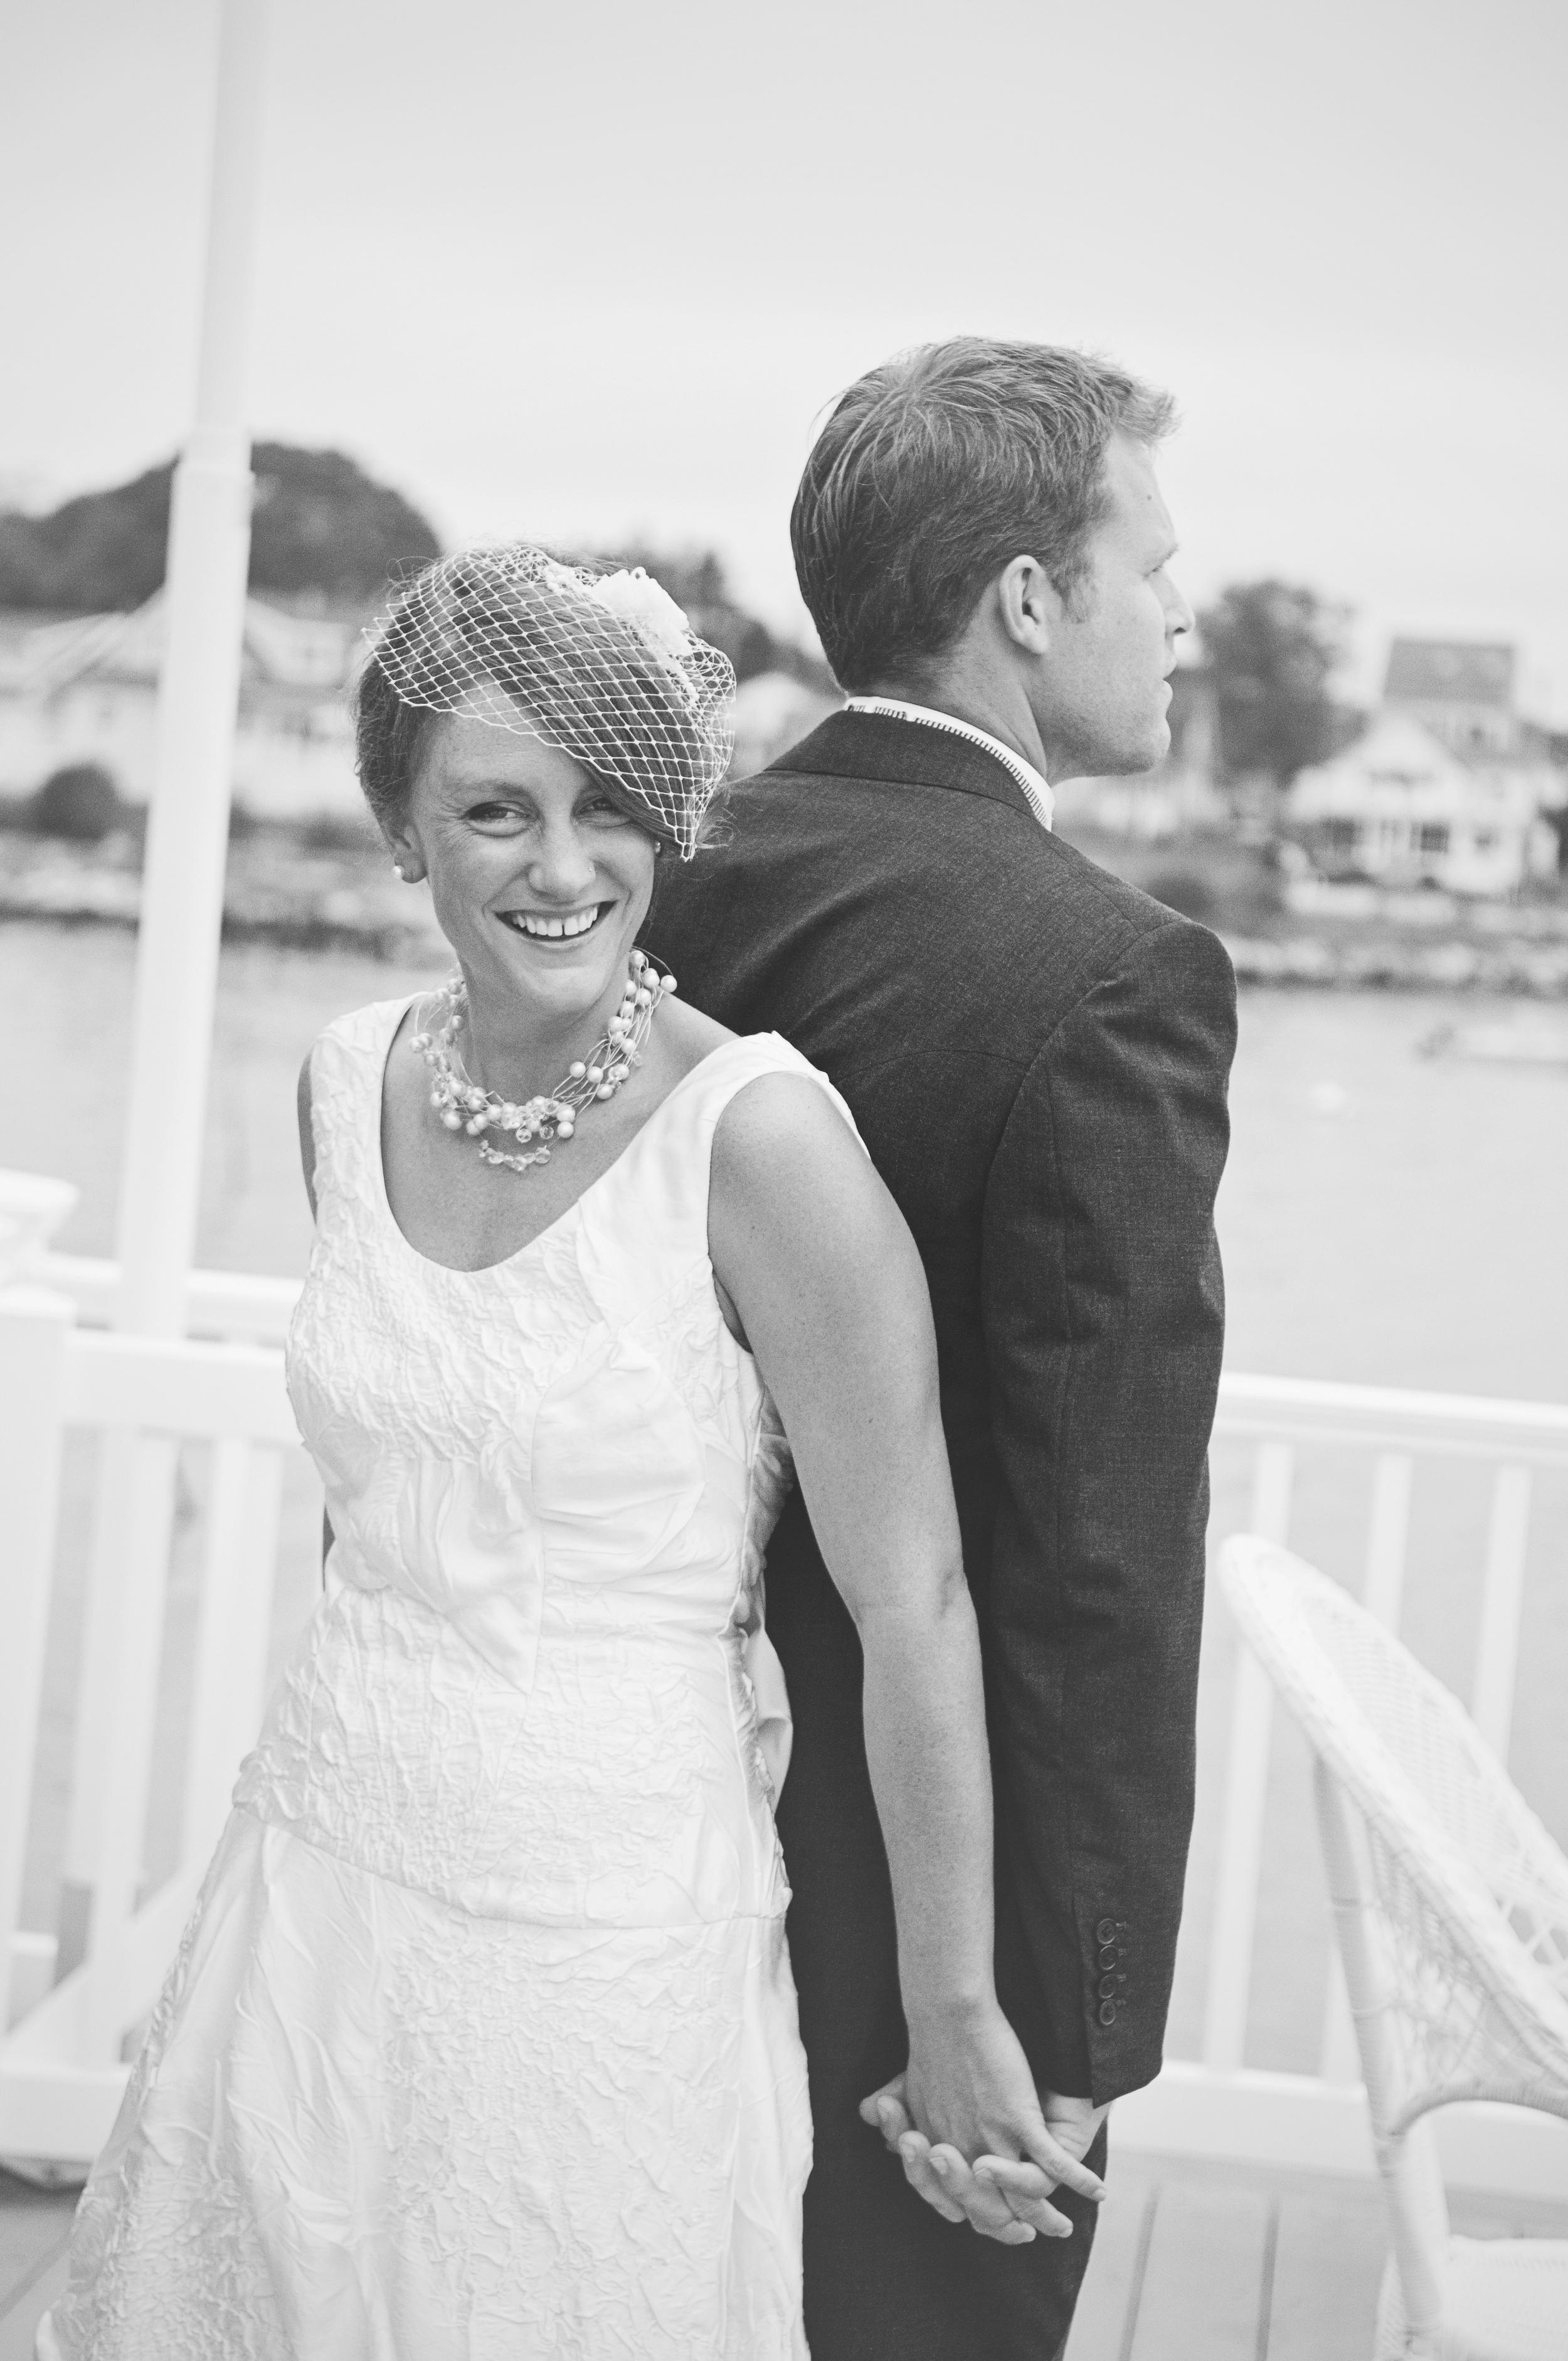 Angela_Chicoski_CT_wedding_photographer_086.jpg